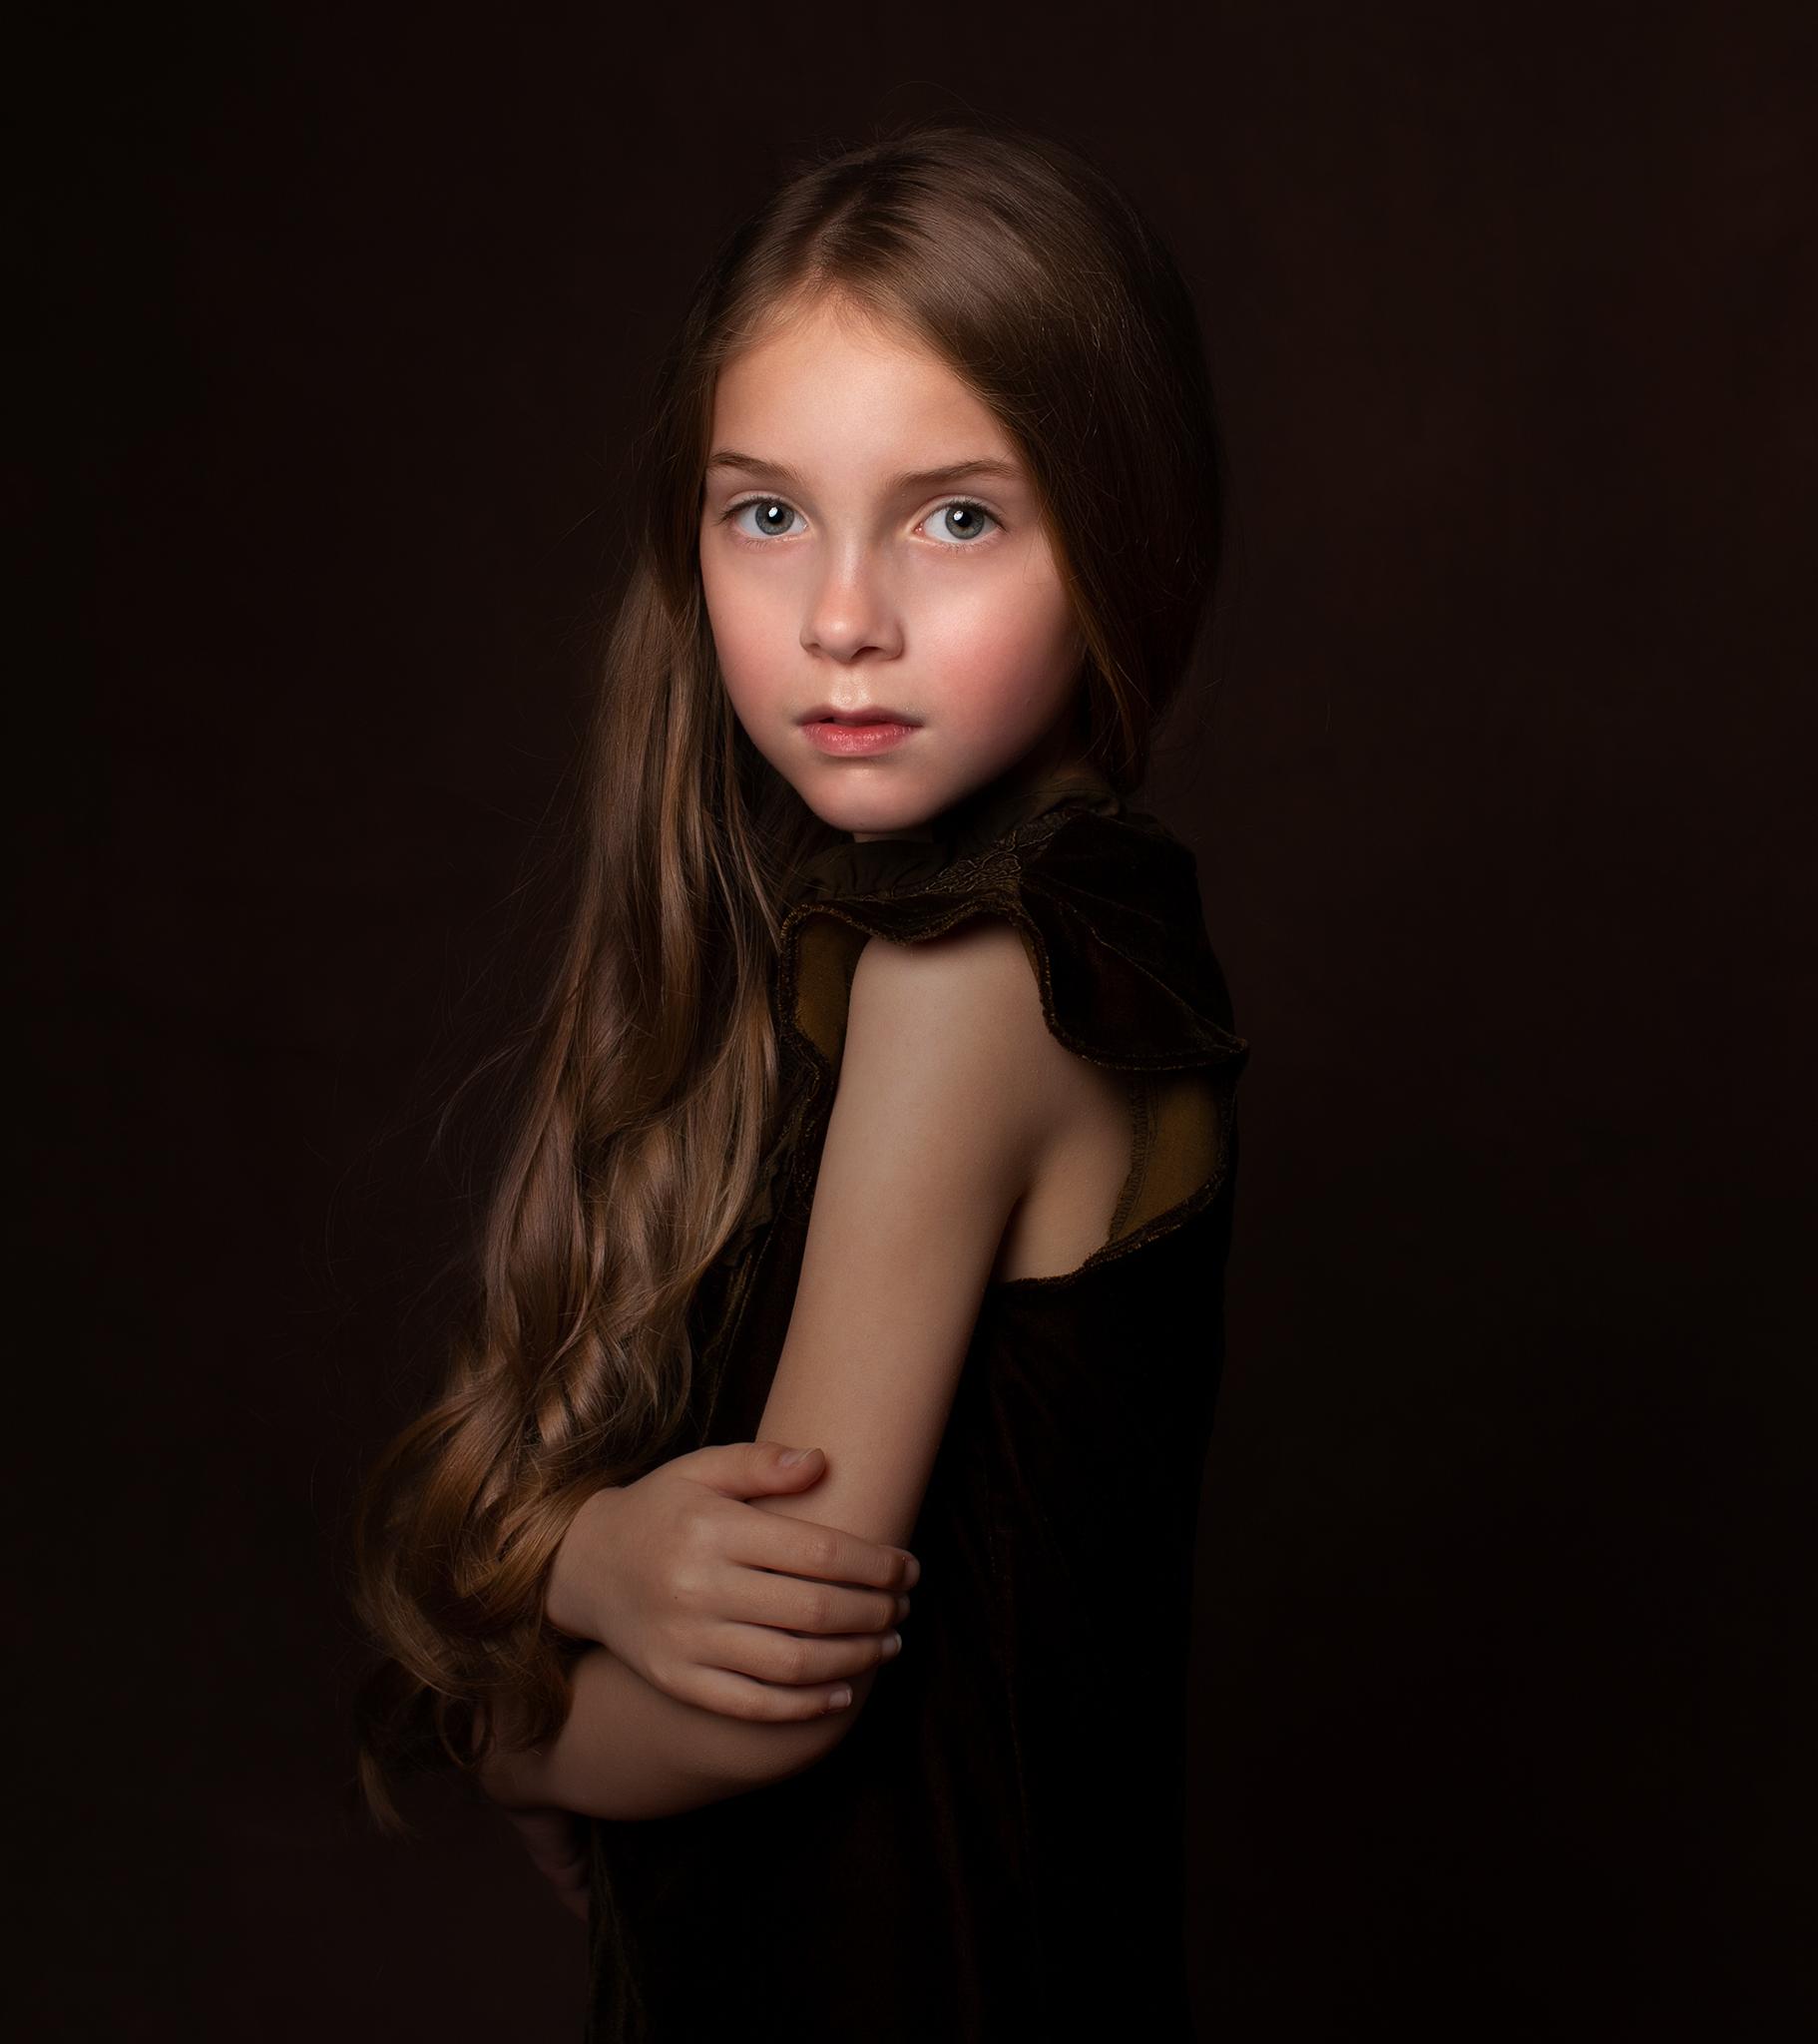 elizabethg_fineart_portrait_photography_eva_003.jpg